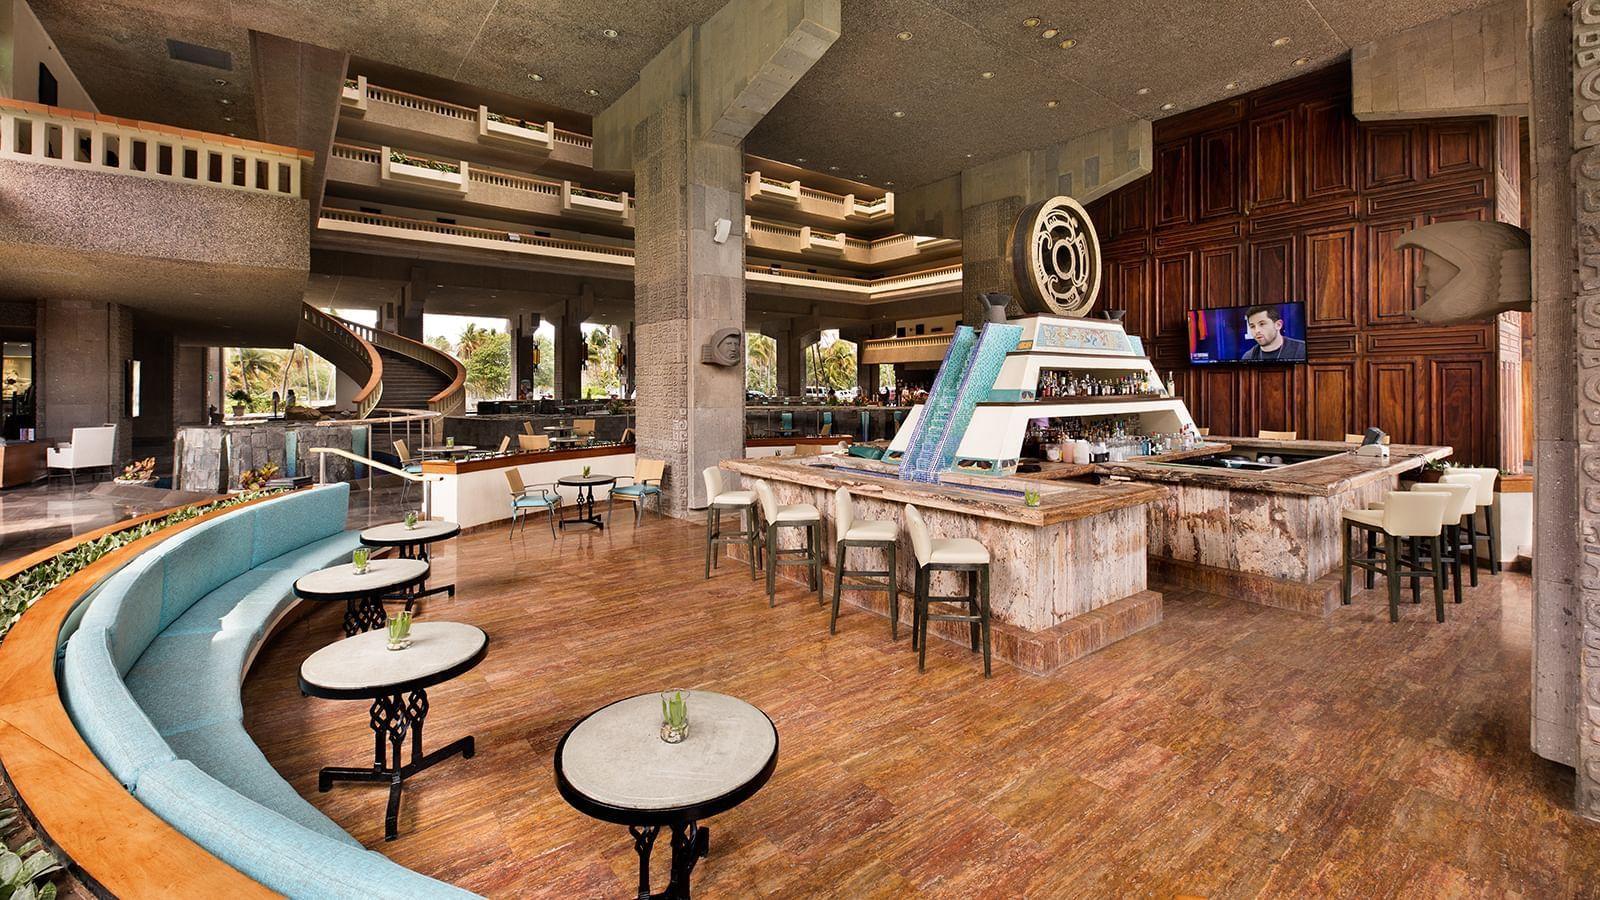 Indoor seating area at Laguna Bar in Princess Mundo Imperial